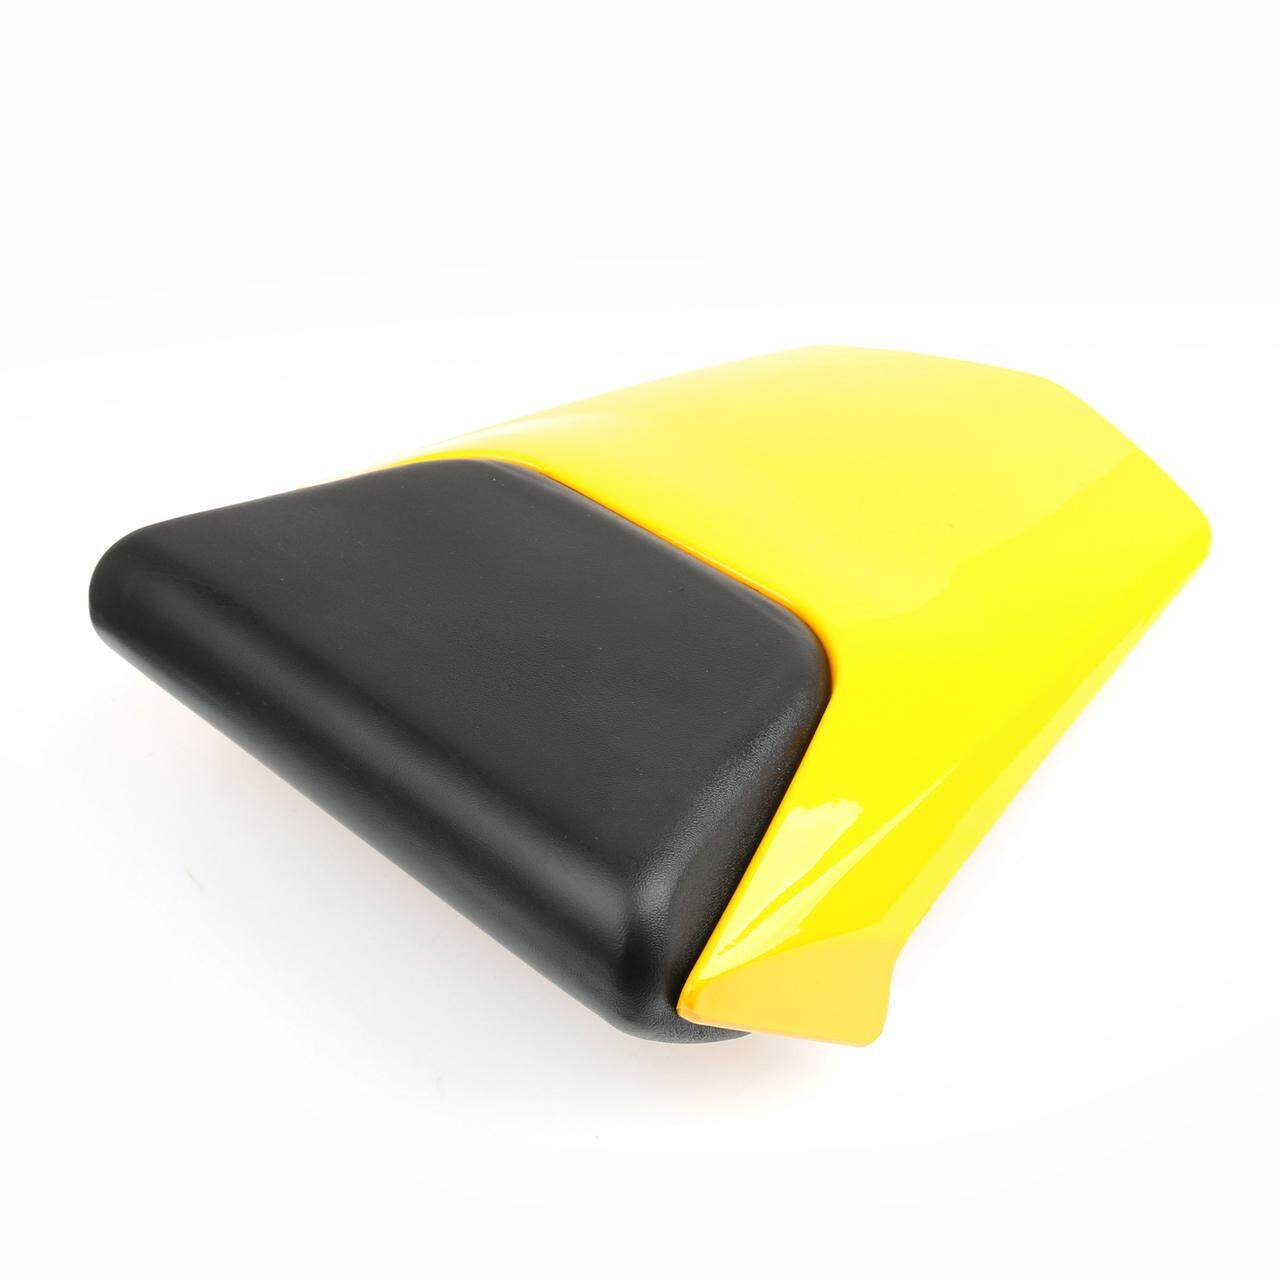 Seat Cowl Rear Passenger Pillion Seat Cover R1 YZFR1 (2000-2001) Yellow